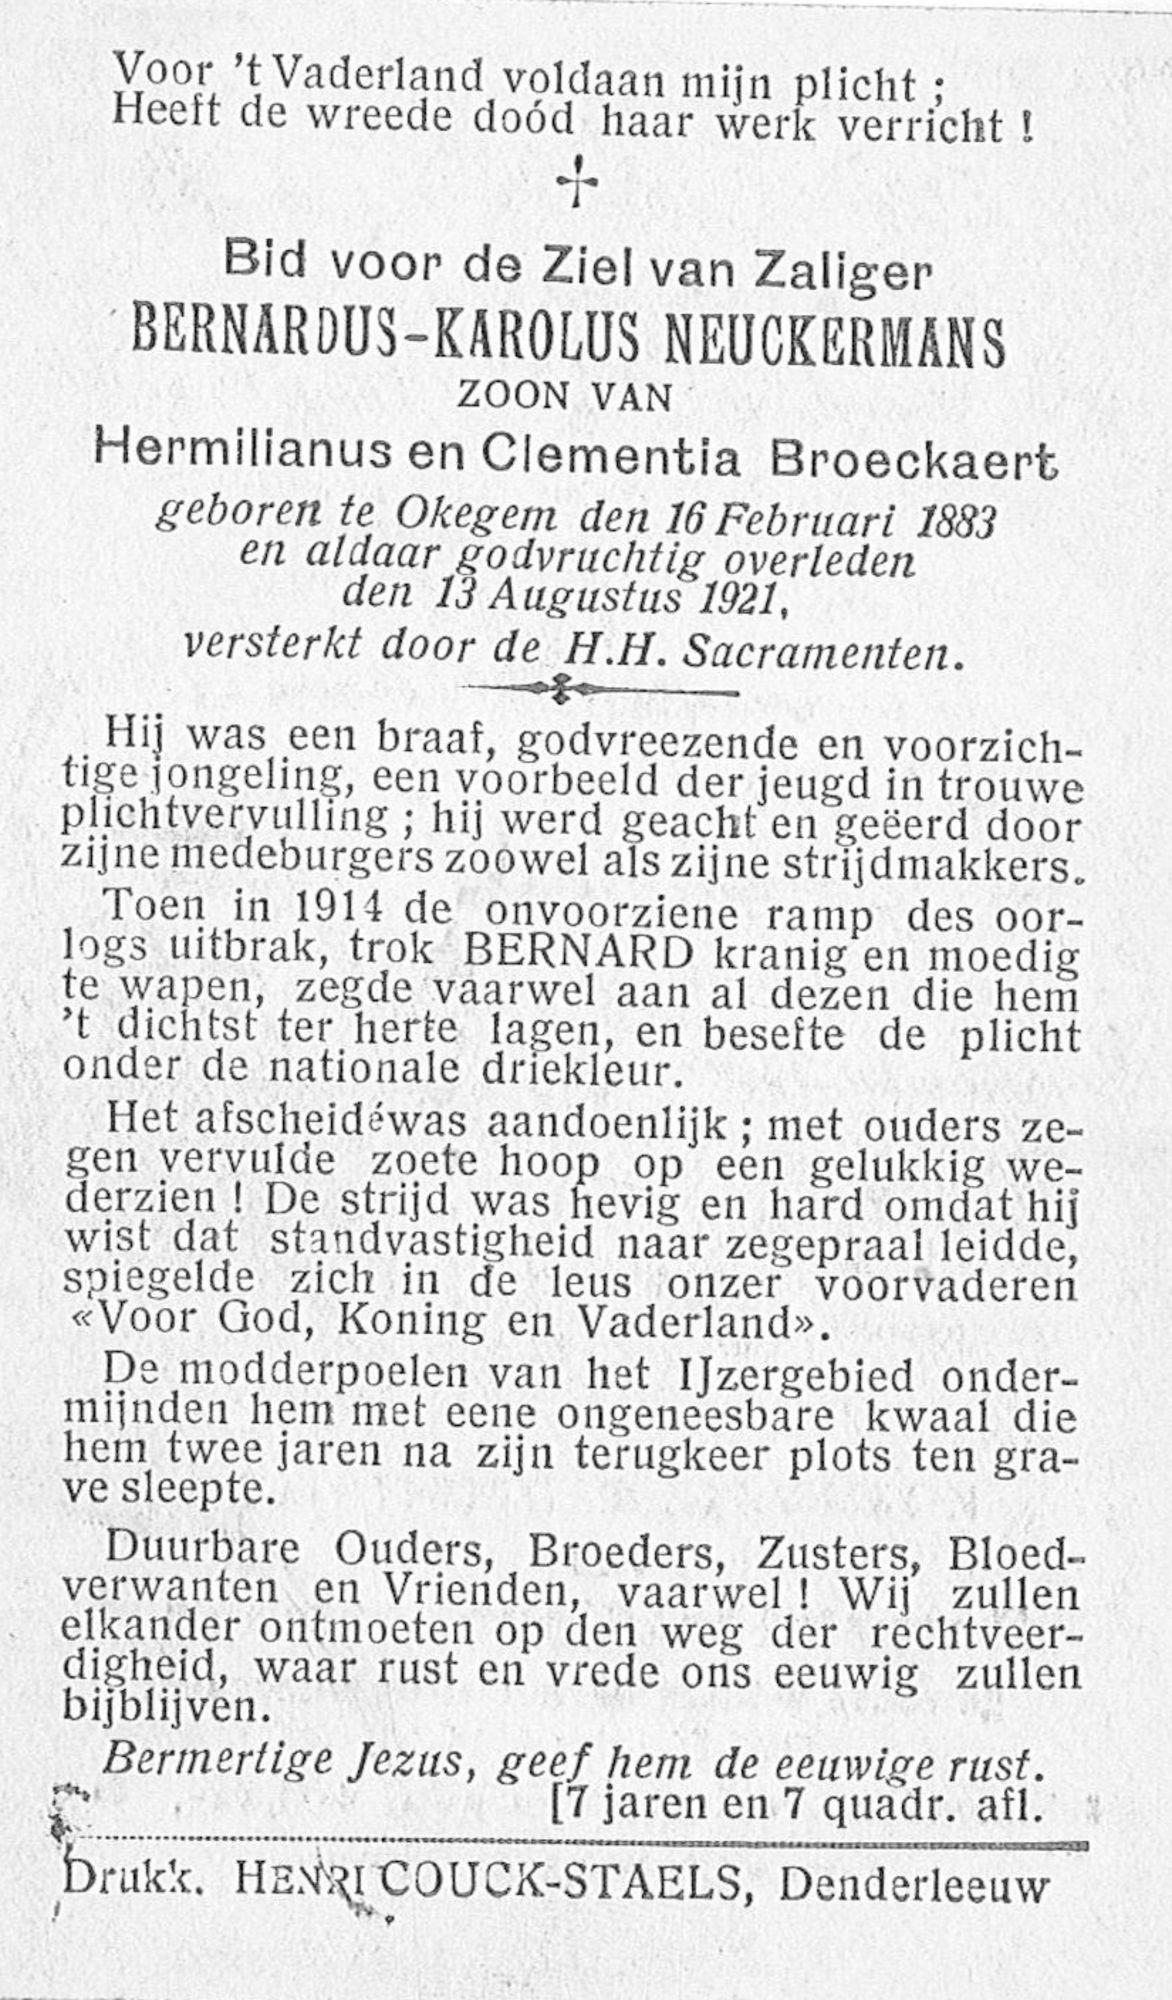 Bernardus-Karolus Neuckermans